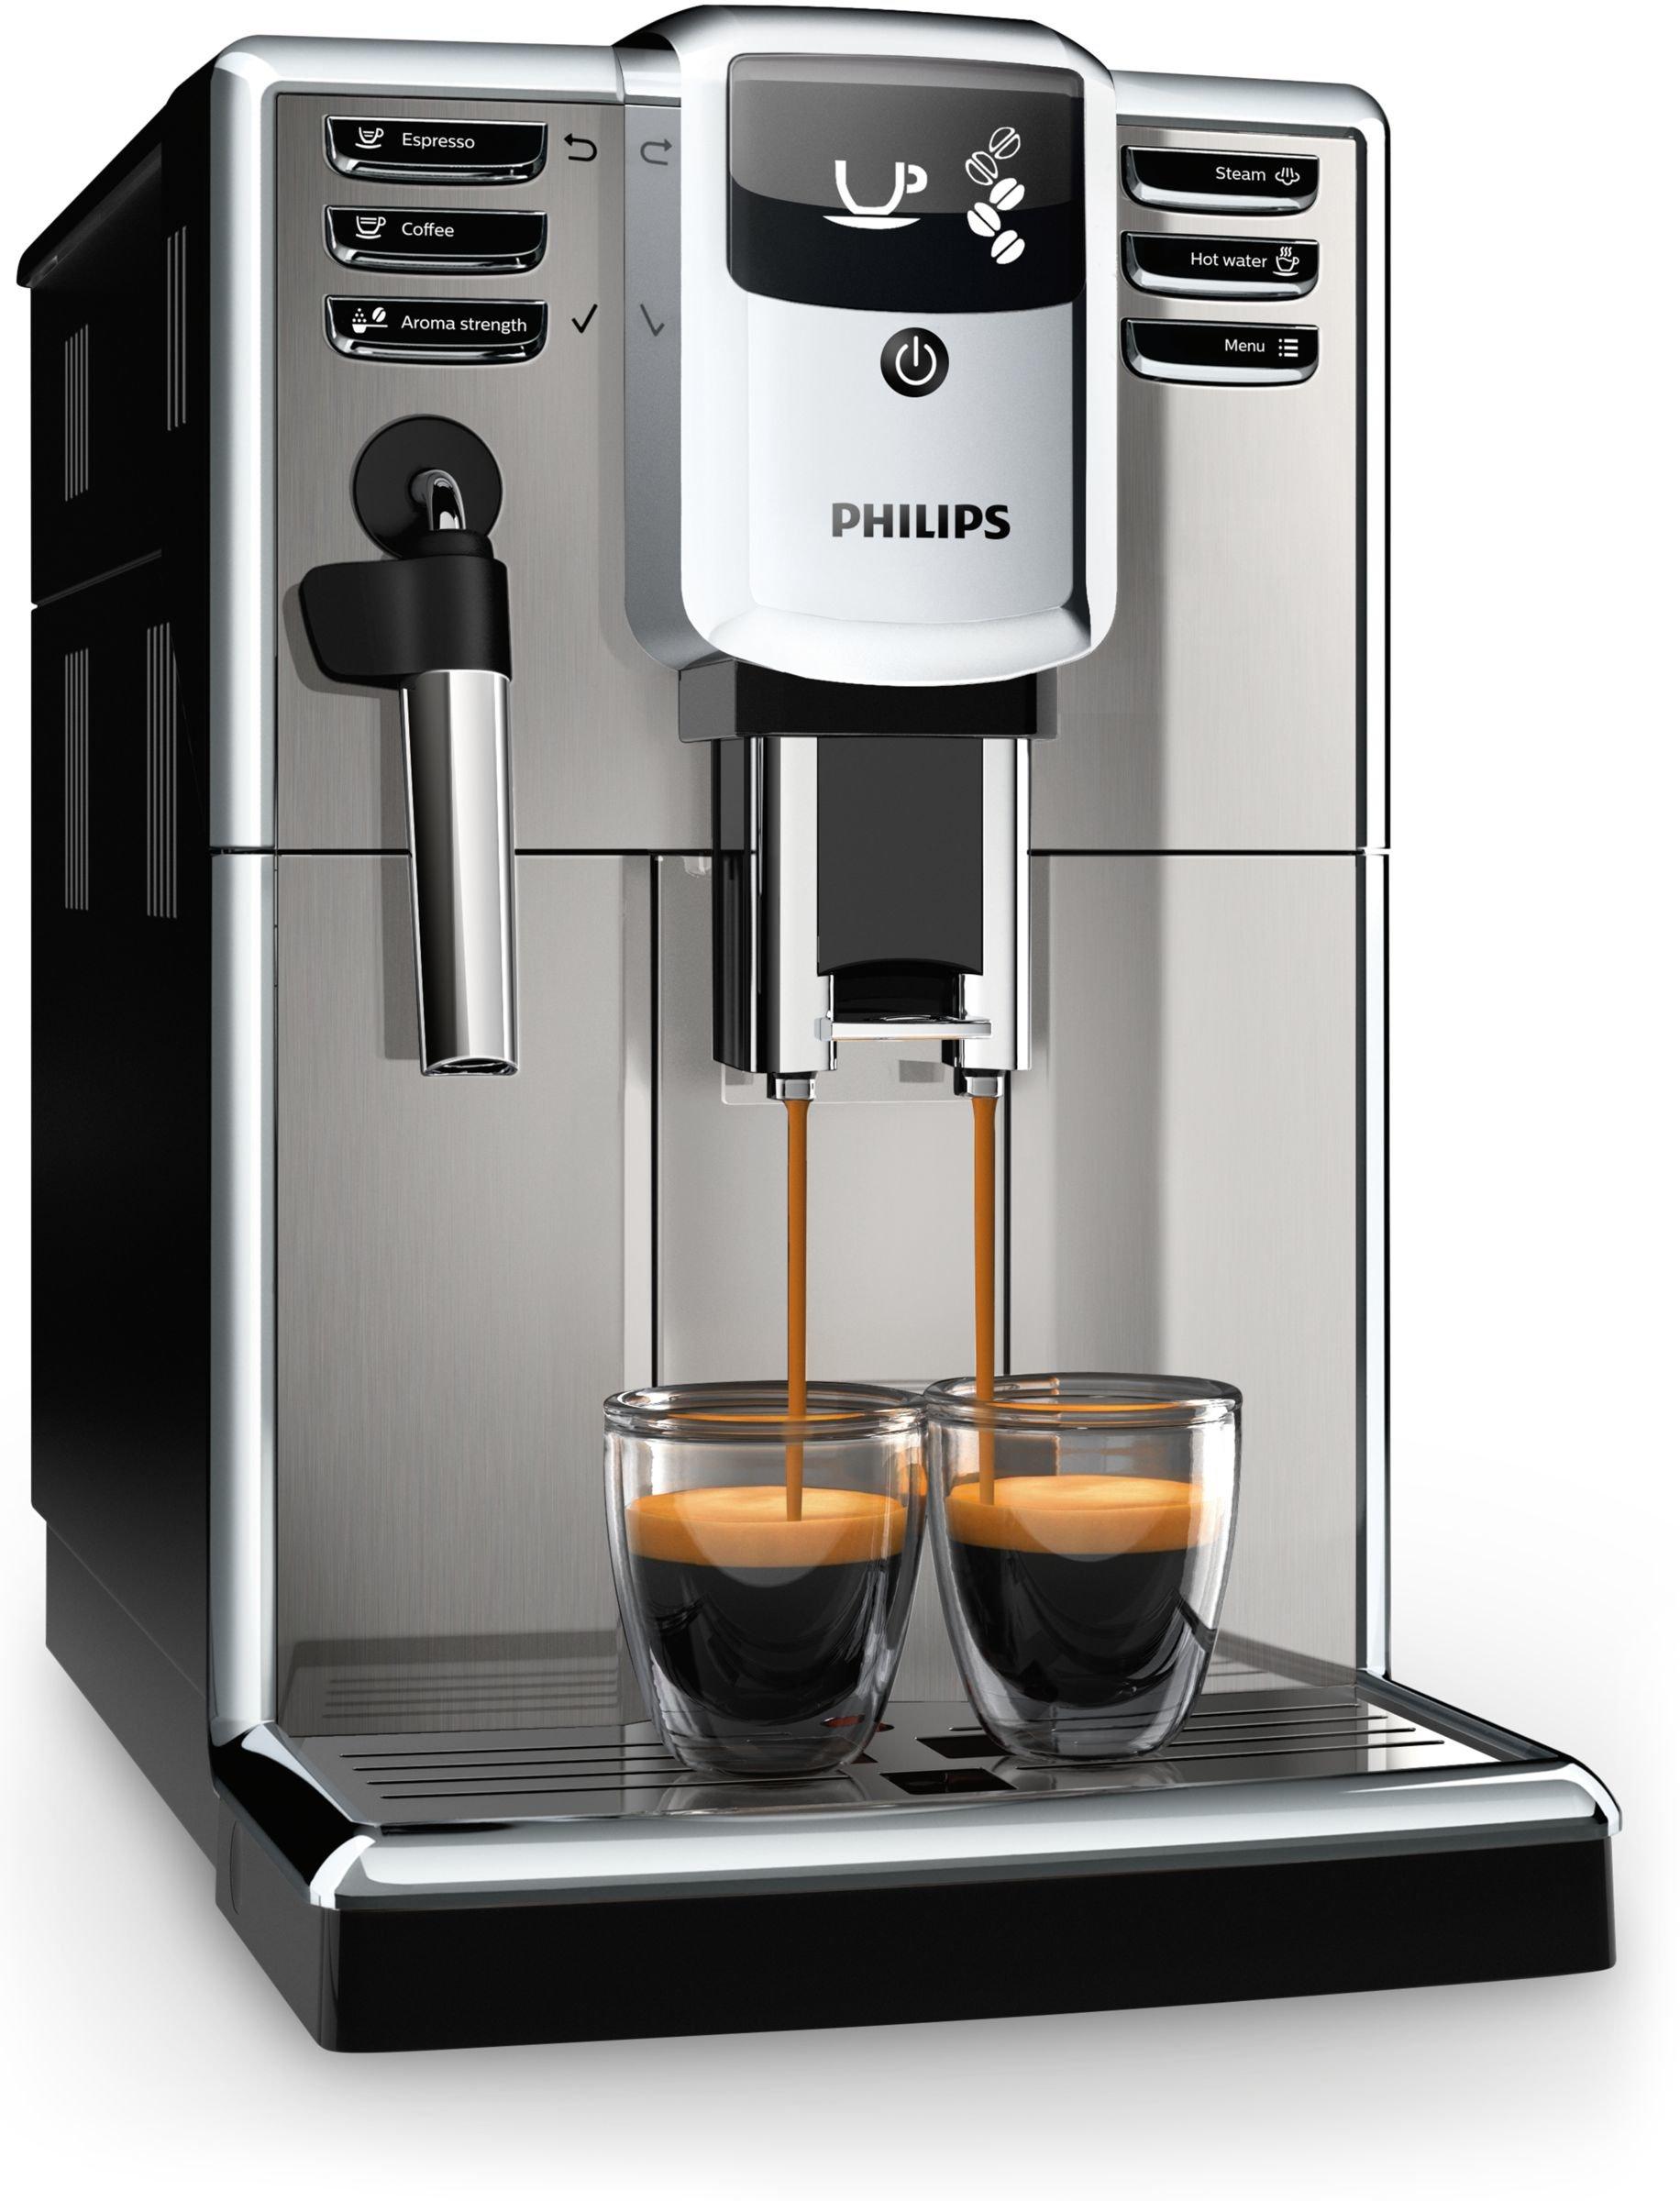 Philips-Kaffeevollautomat-EP531510-Vollkaffeeautomat-Kunststoff-18-liters-Schwarz-Edelstahl